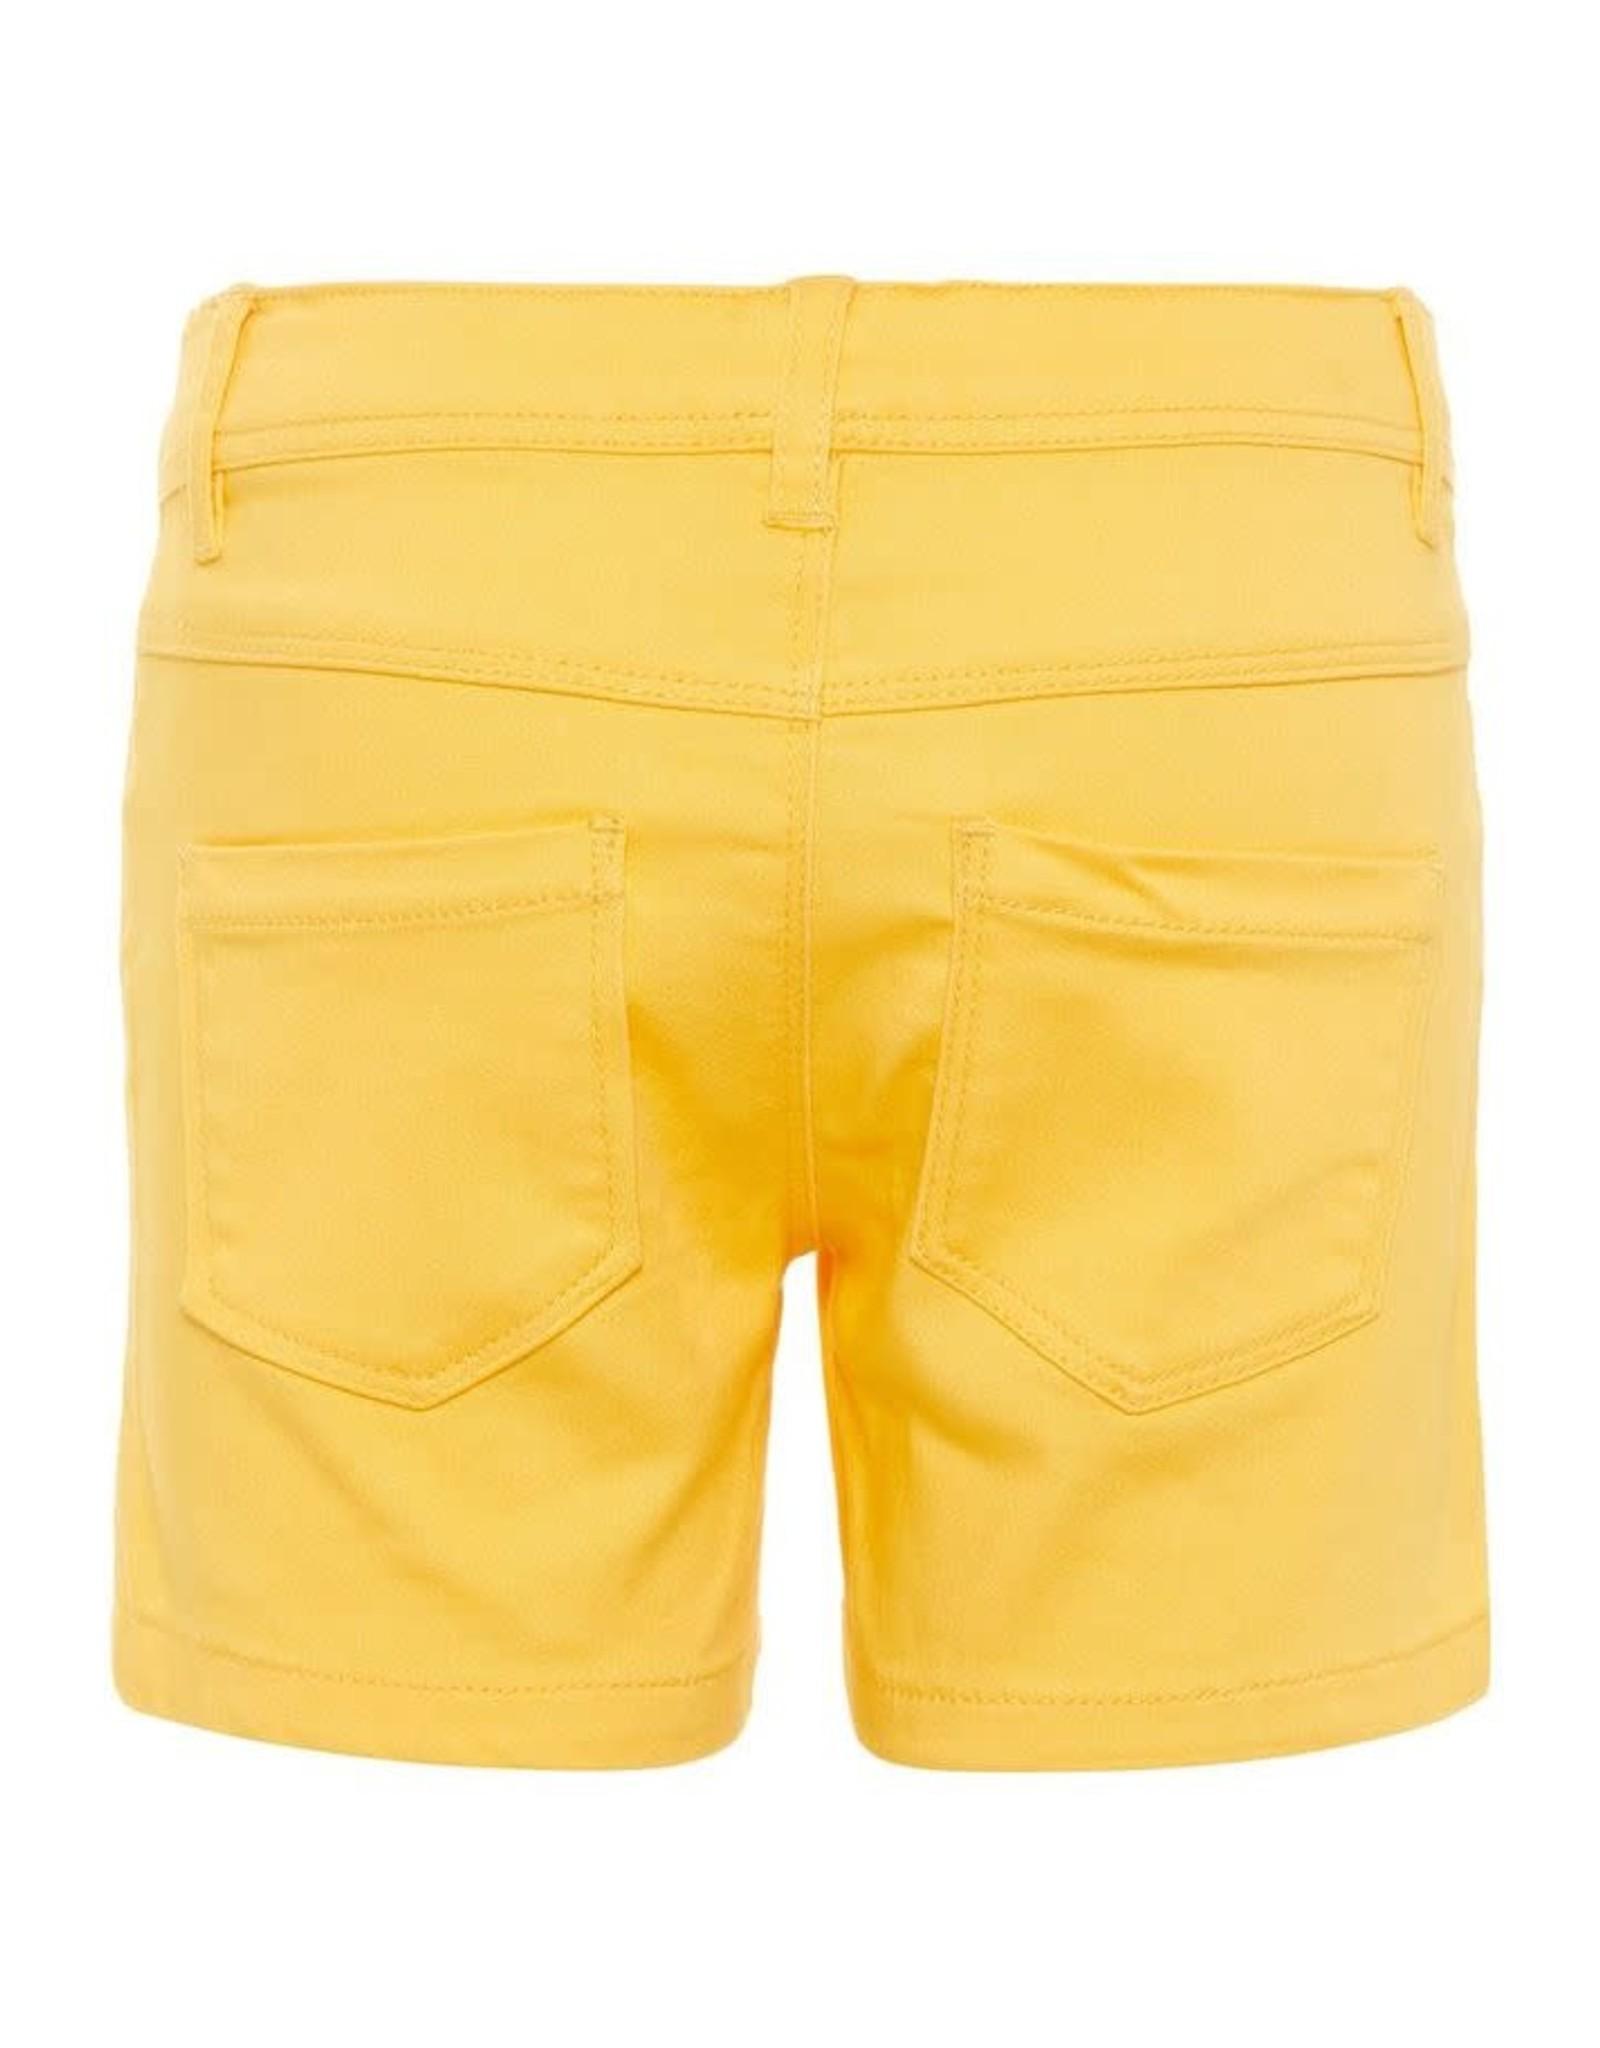 Name It Name It Meisjes Katoenen Short (3 kleuren)